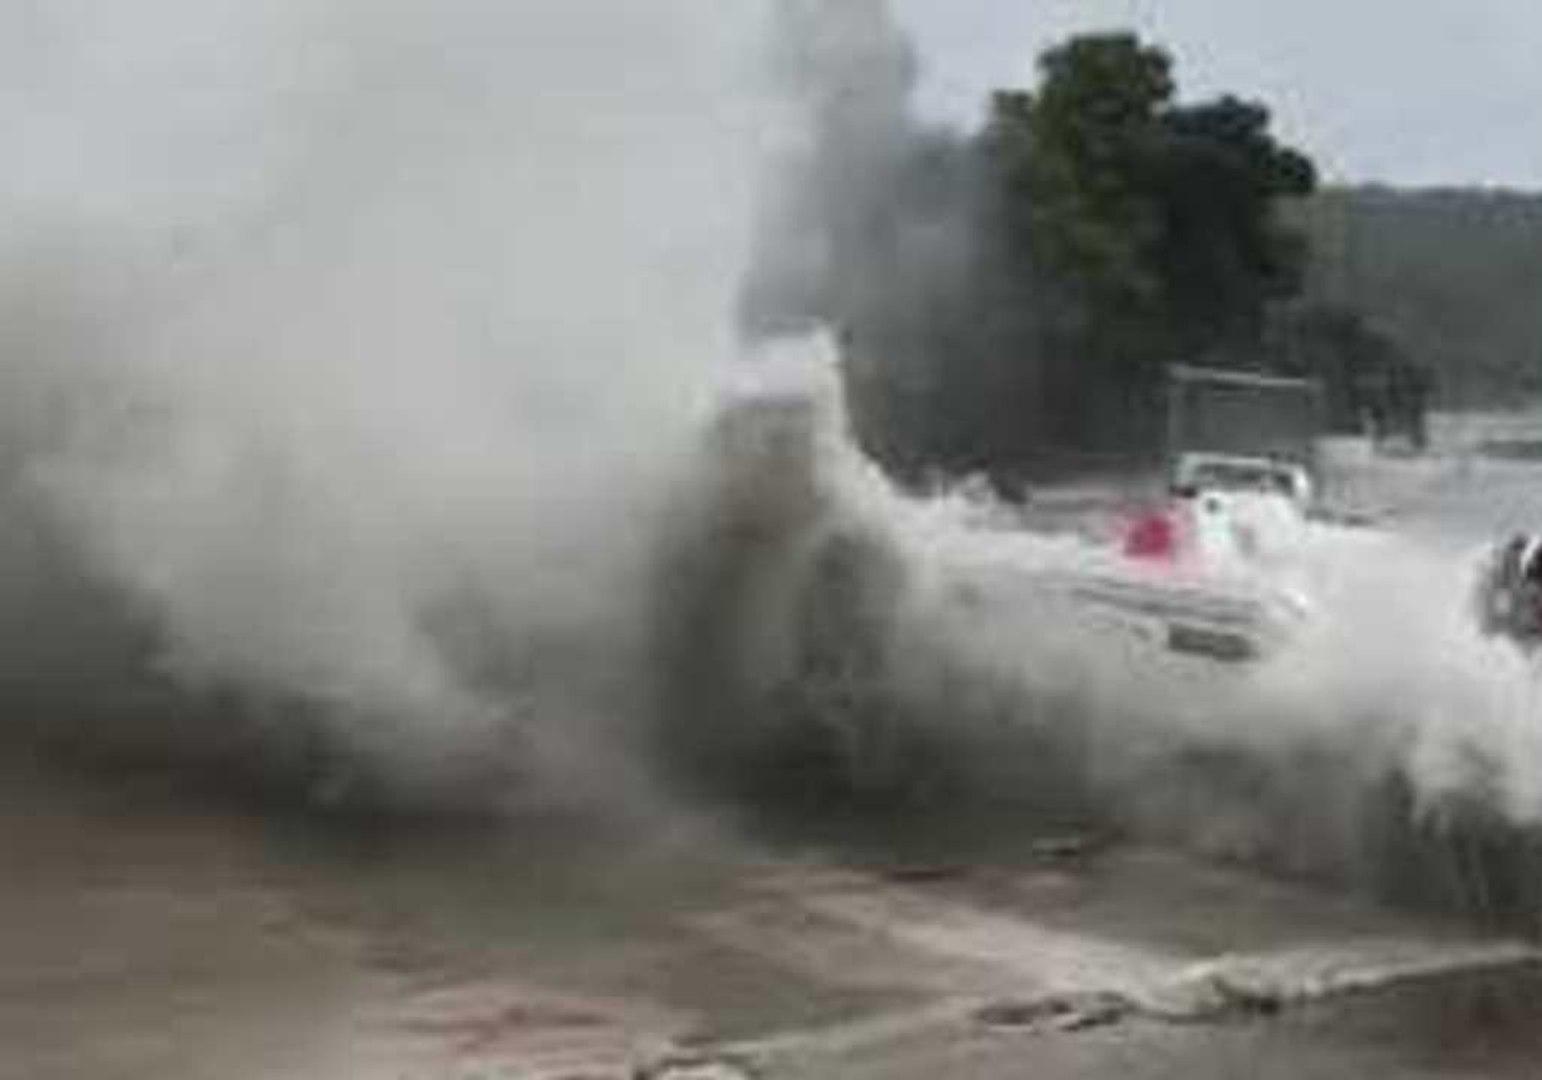 Waves Toss Boat Onto Shore as Cyclone Zorbas Batters Greek Coast